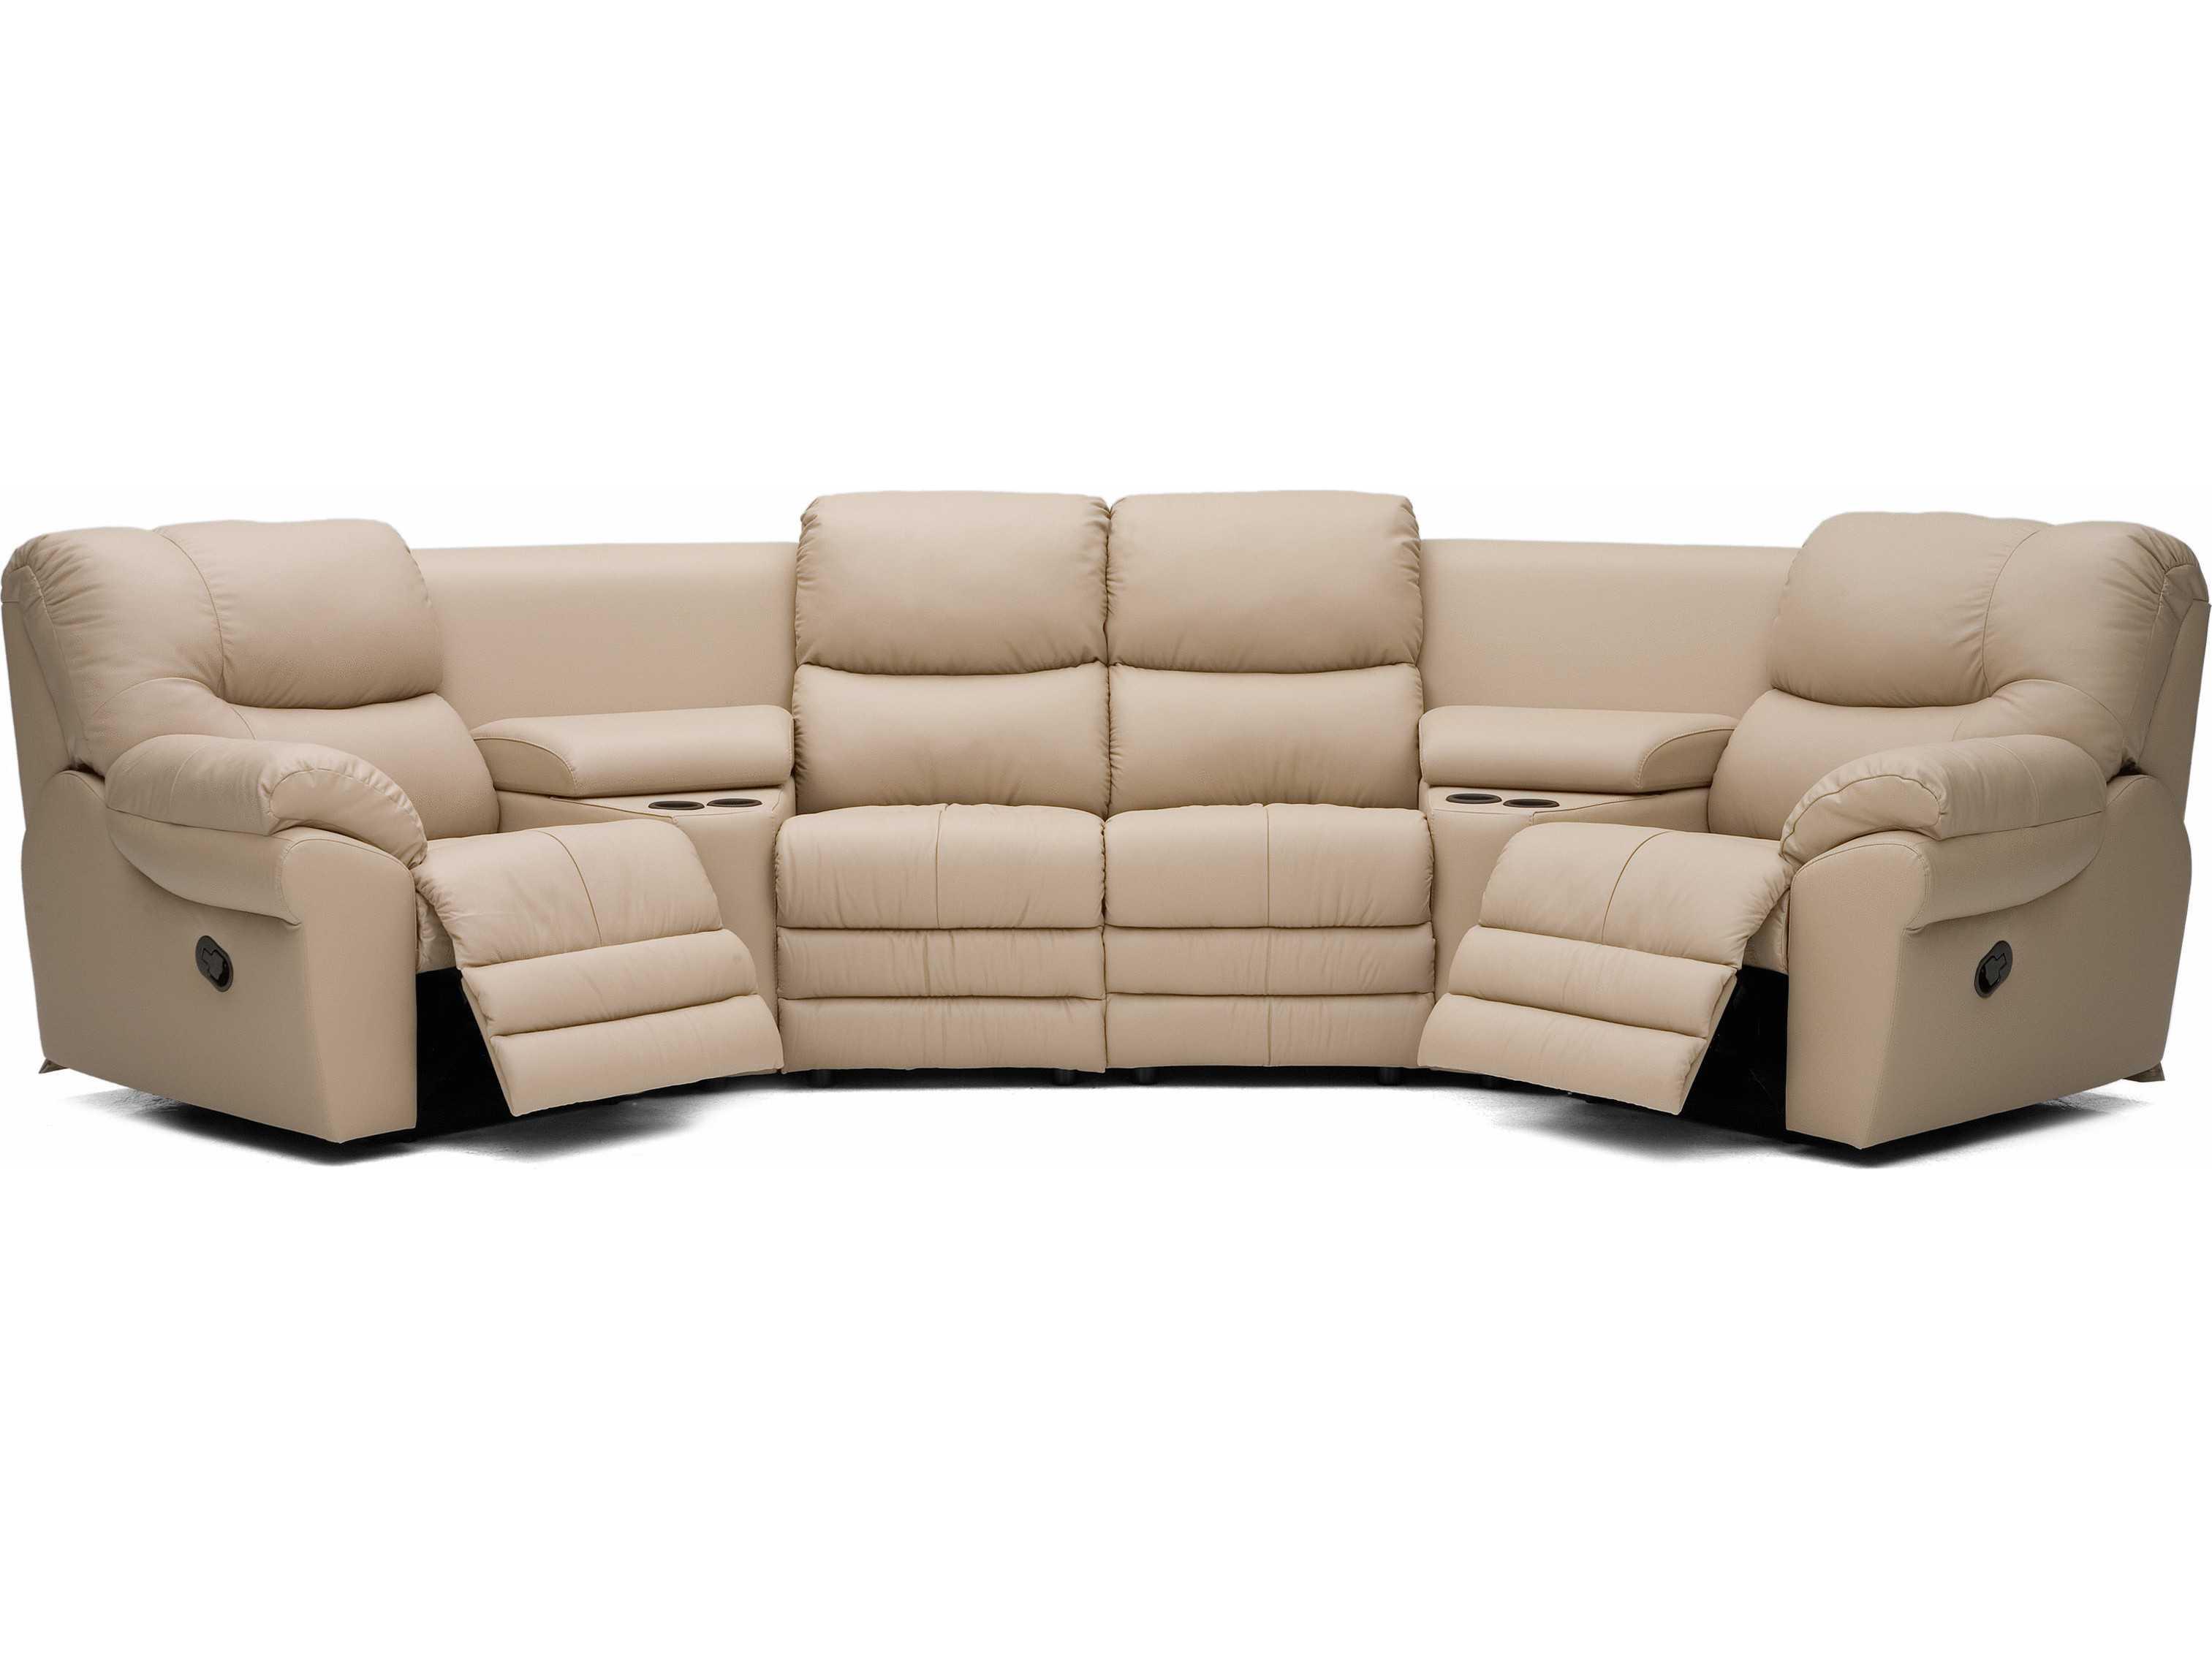 45 Degree Wedge Sectional Sofa